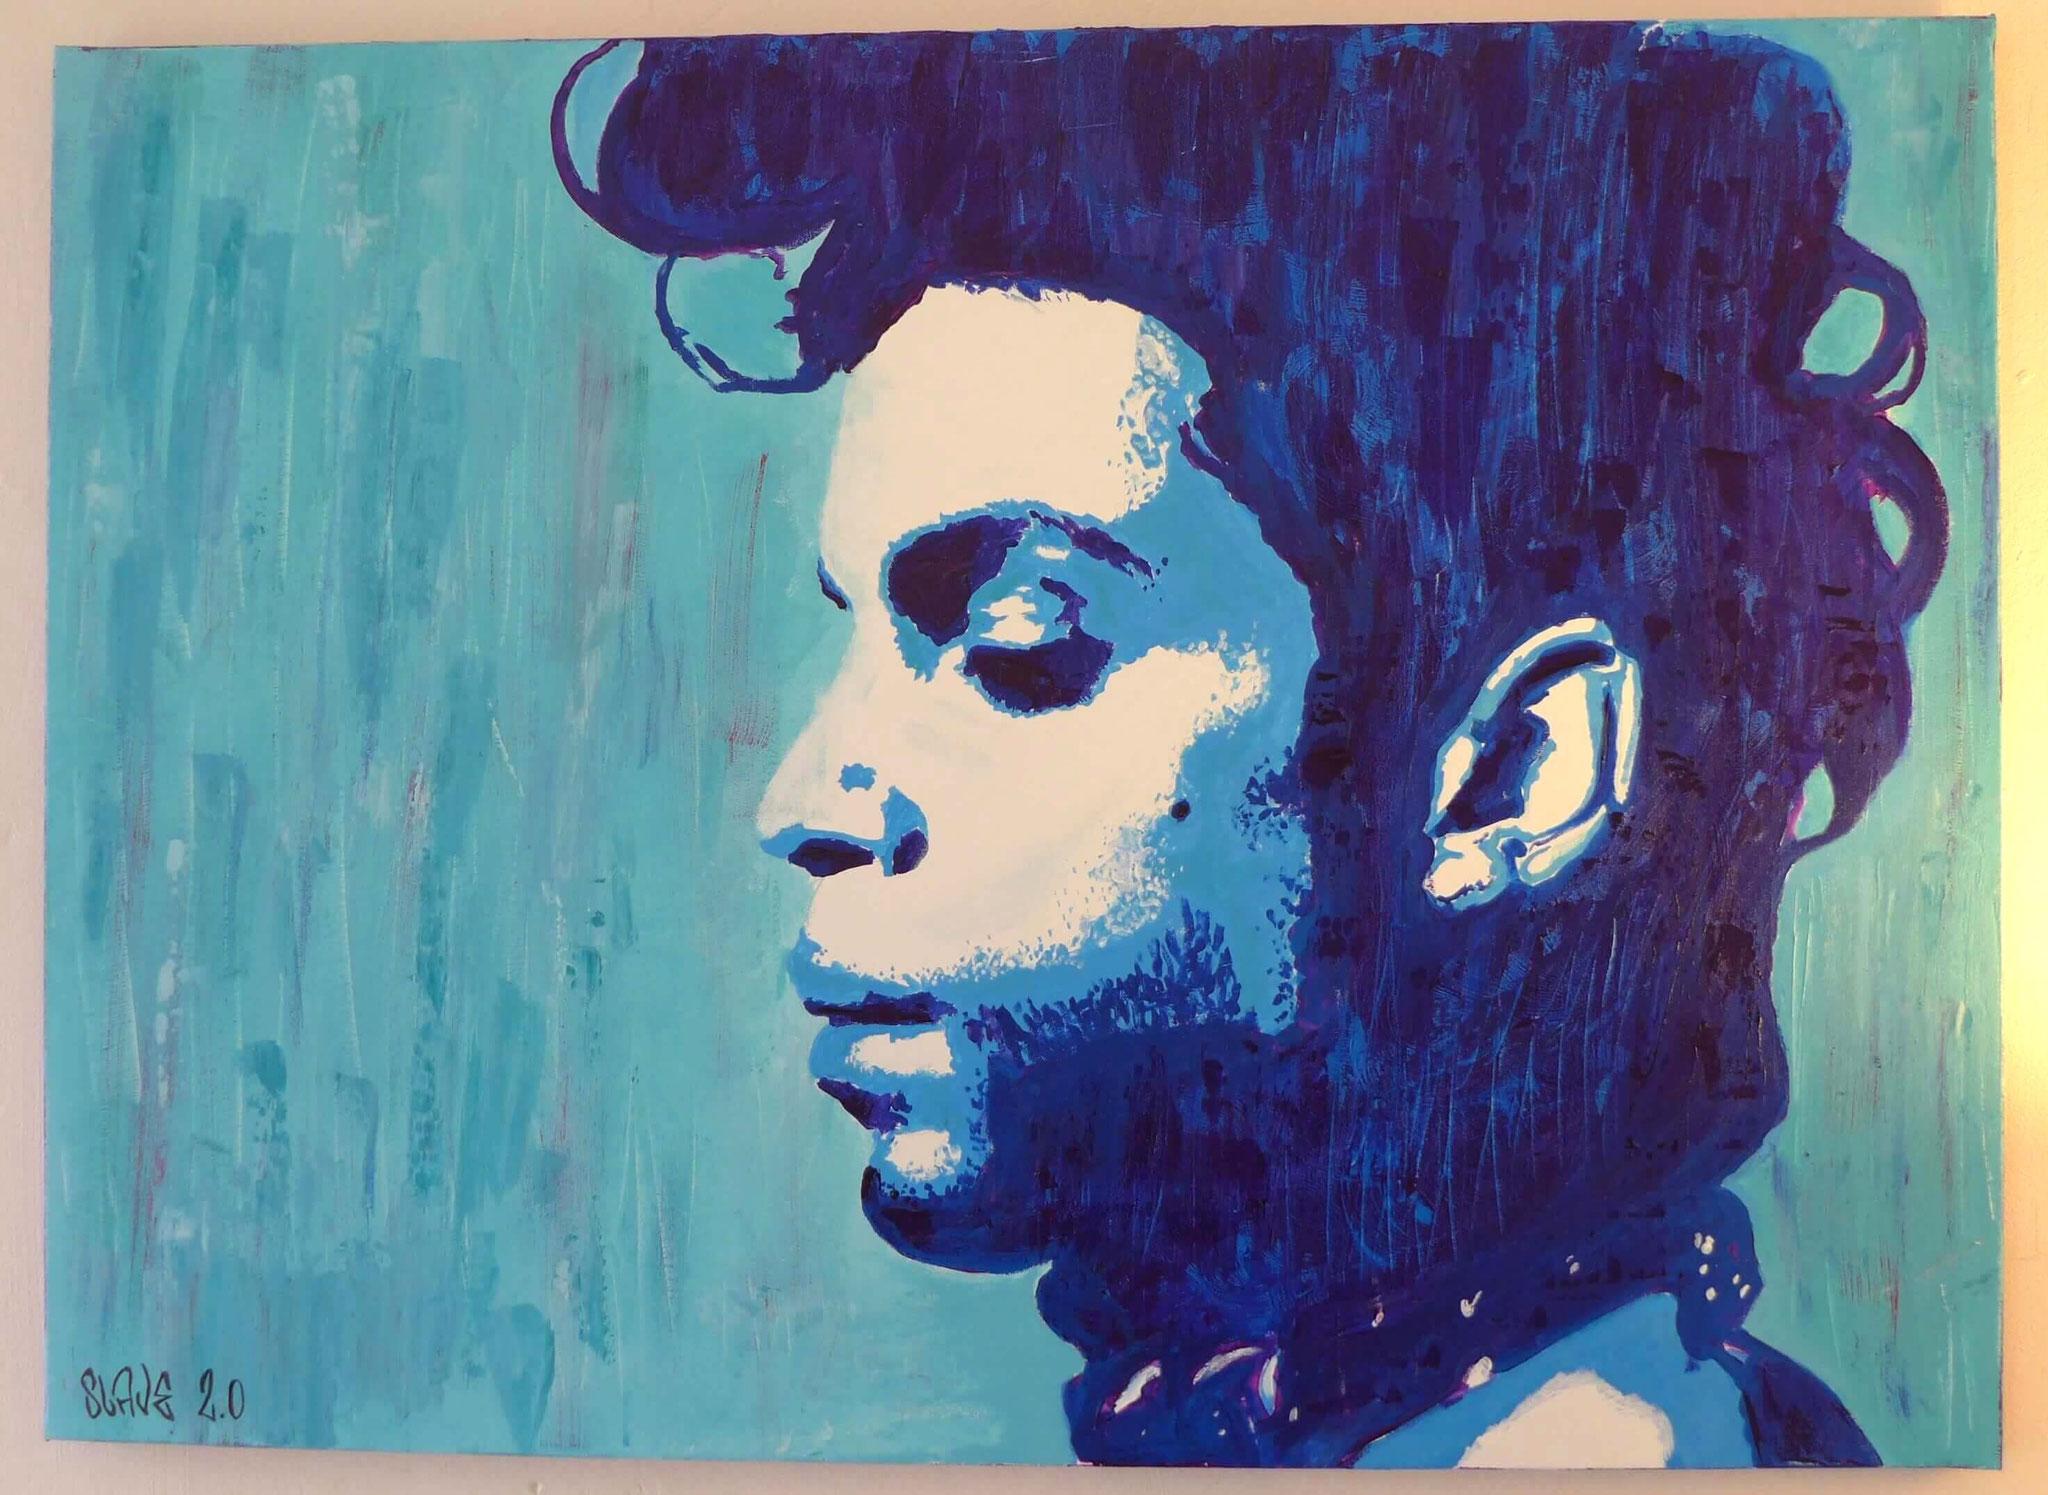 achat tableau prince street art - slave 2.0